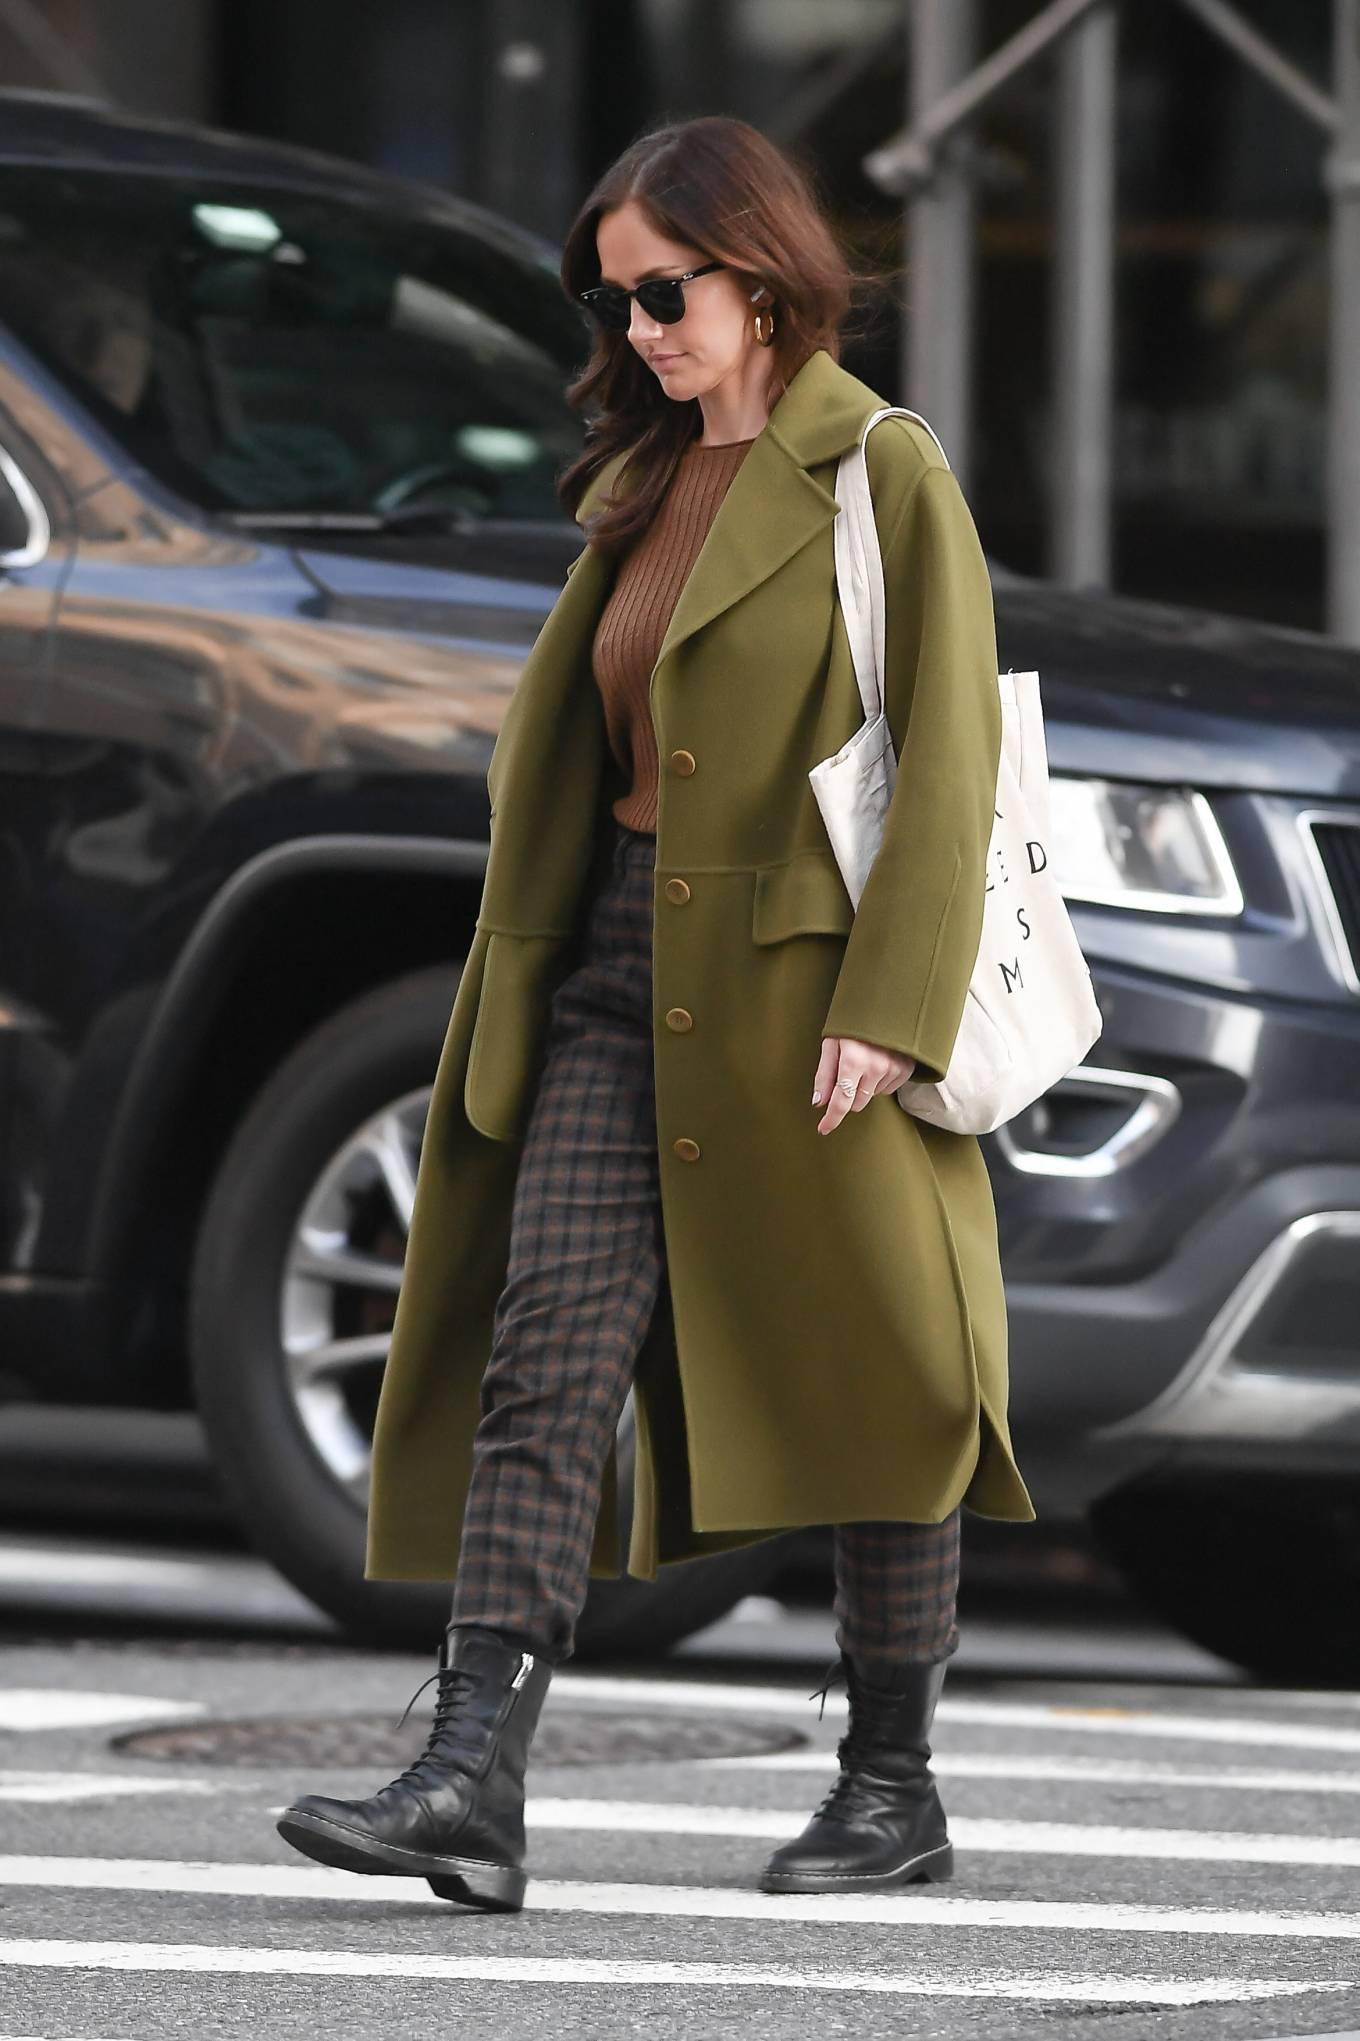 Minka Kelly 2021 : Minka Kelly – In olive green runs errands in New York-02